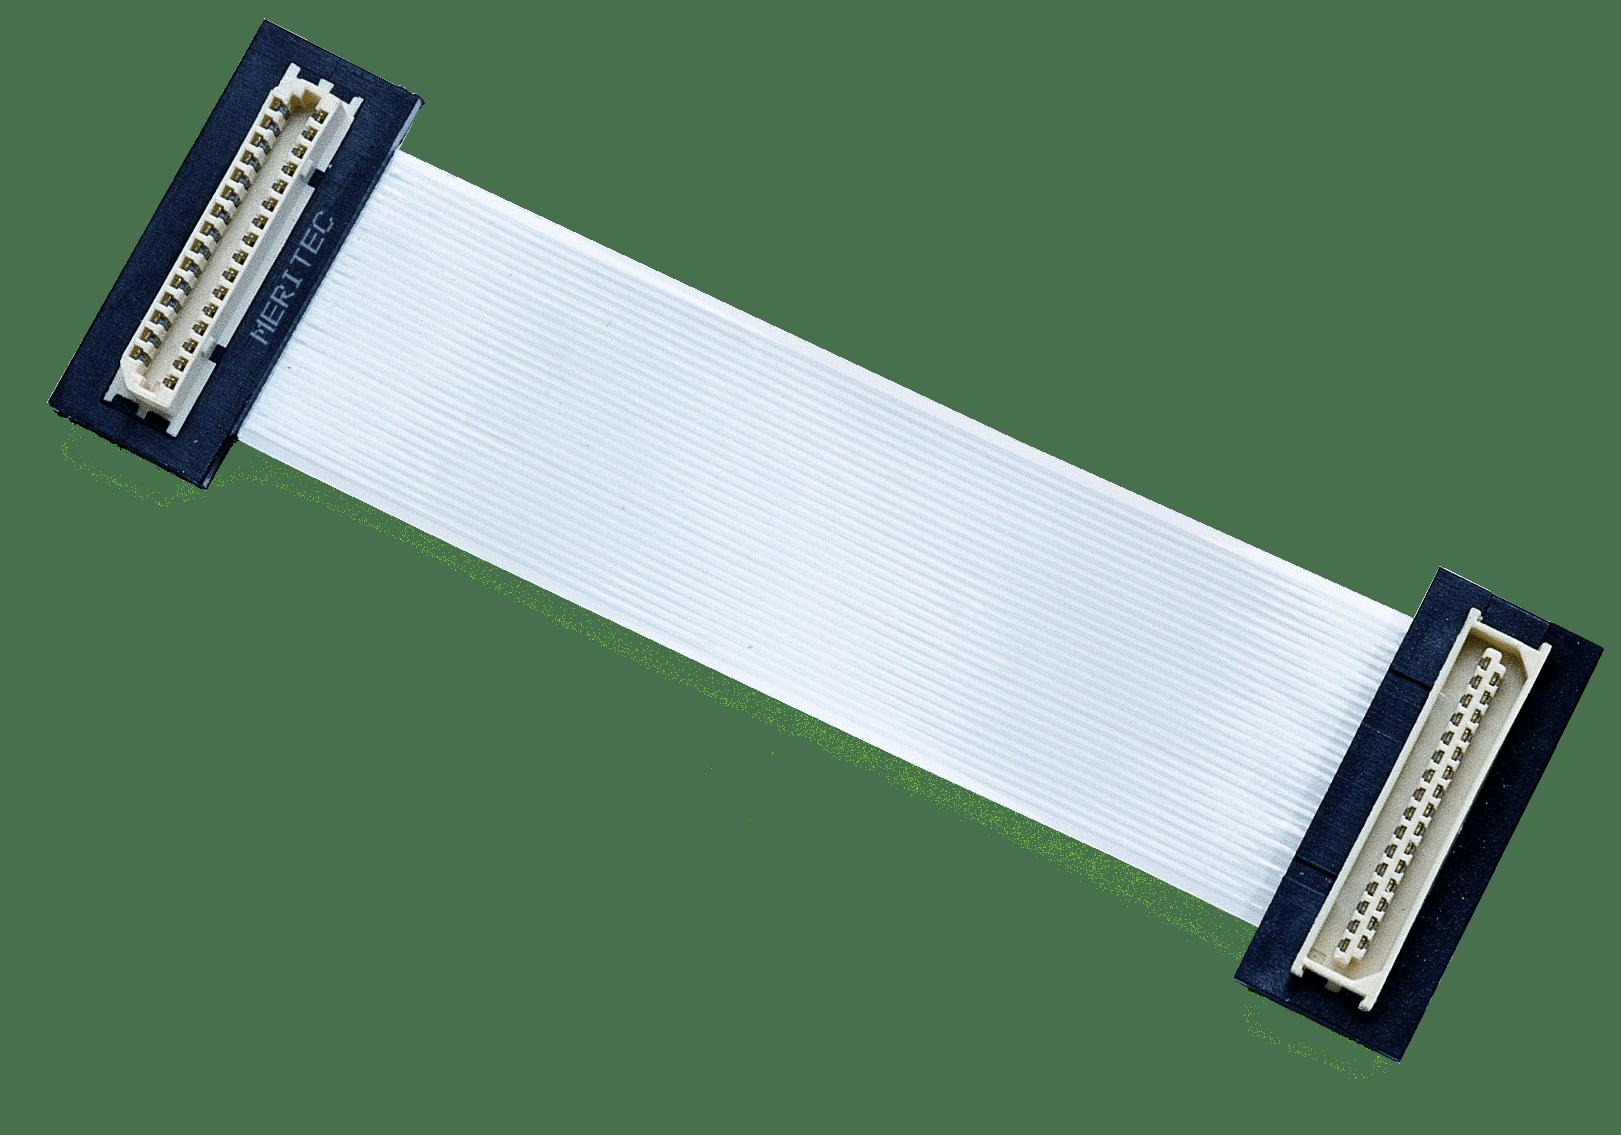 Flat Flex Cable Connector : Ffc ffa t meritec